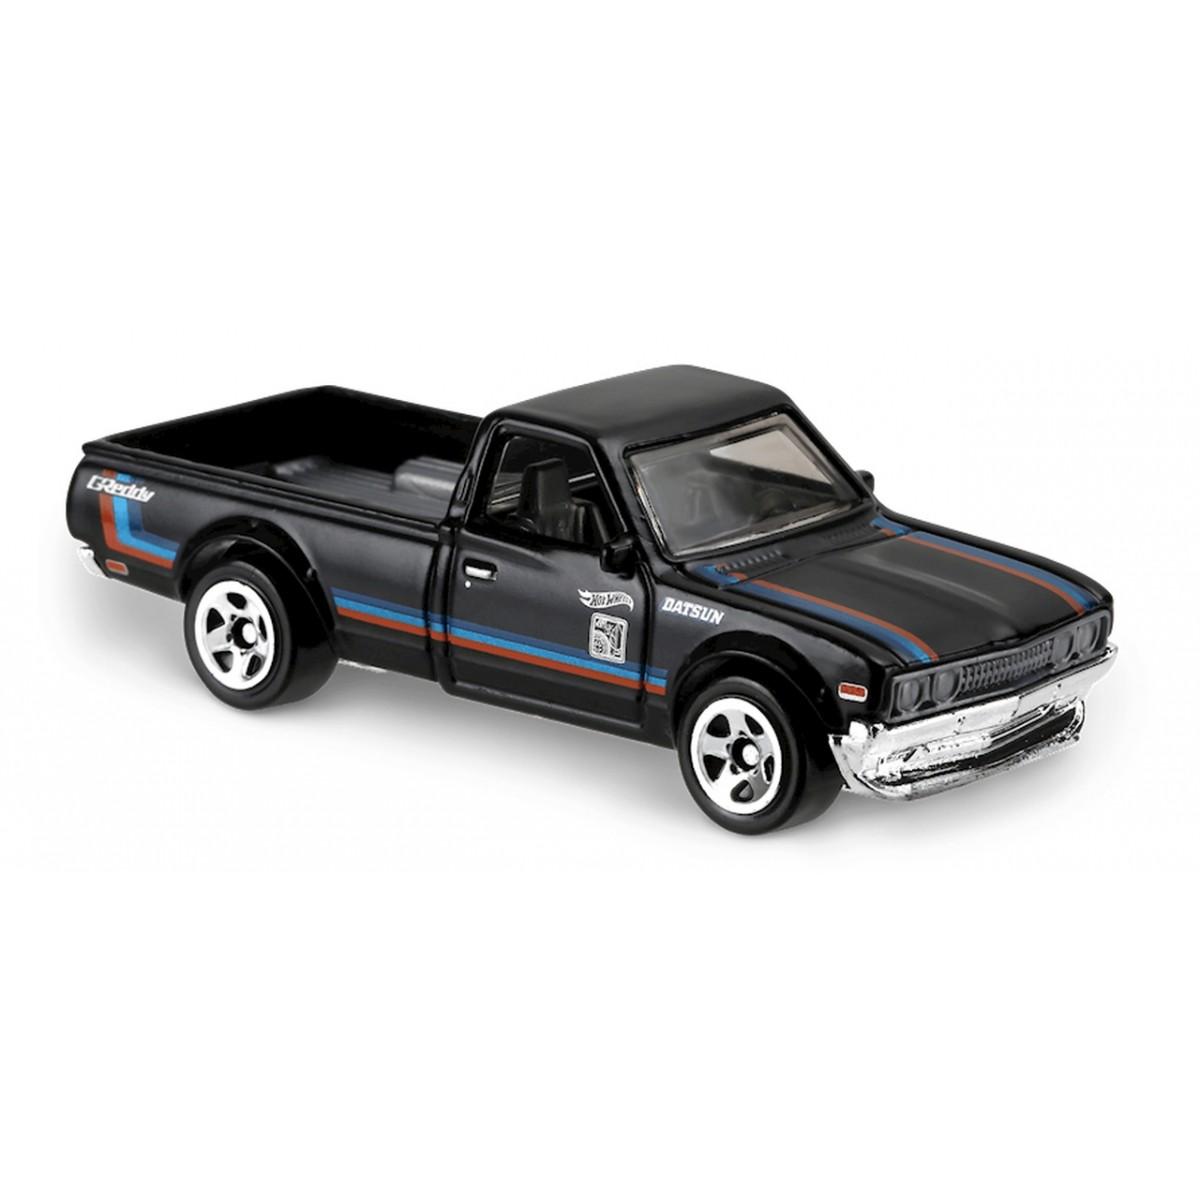 Carrinho Hot Wheels: Datsun 620 Preto